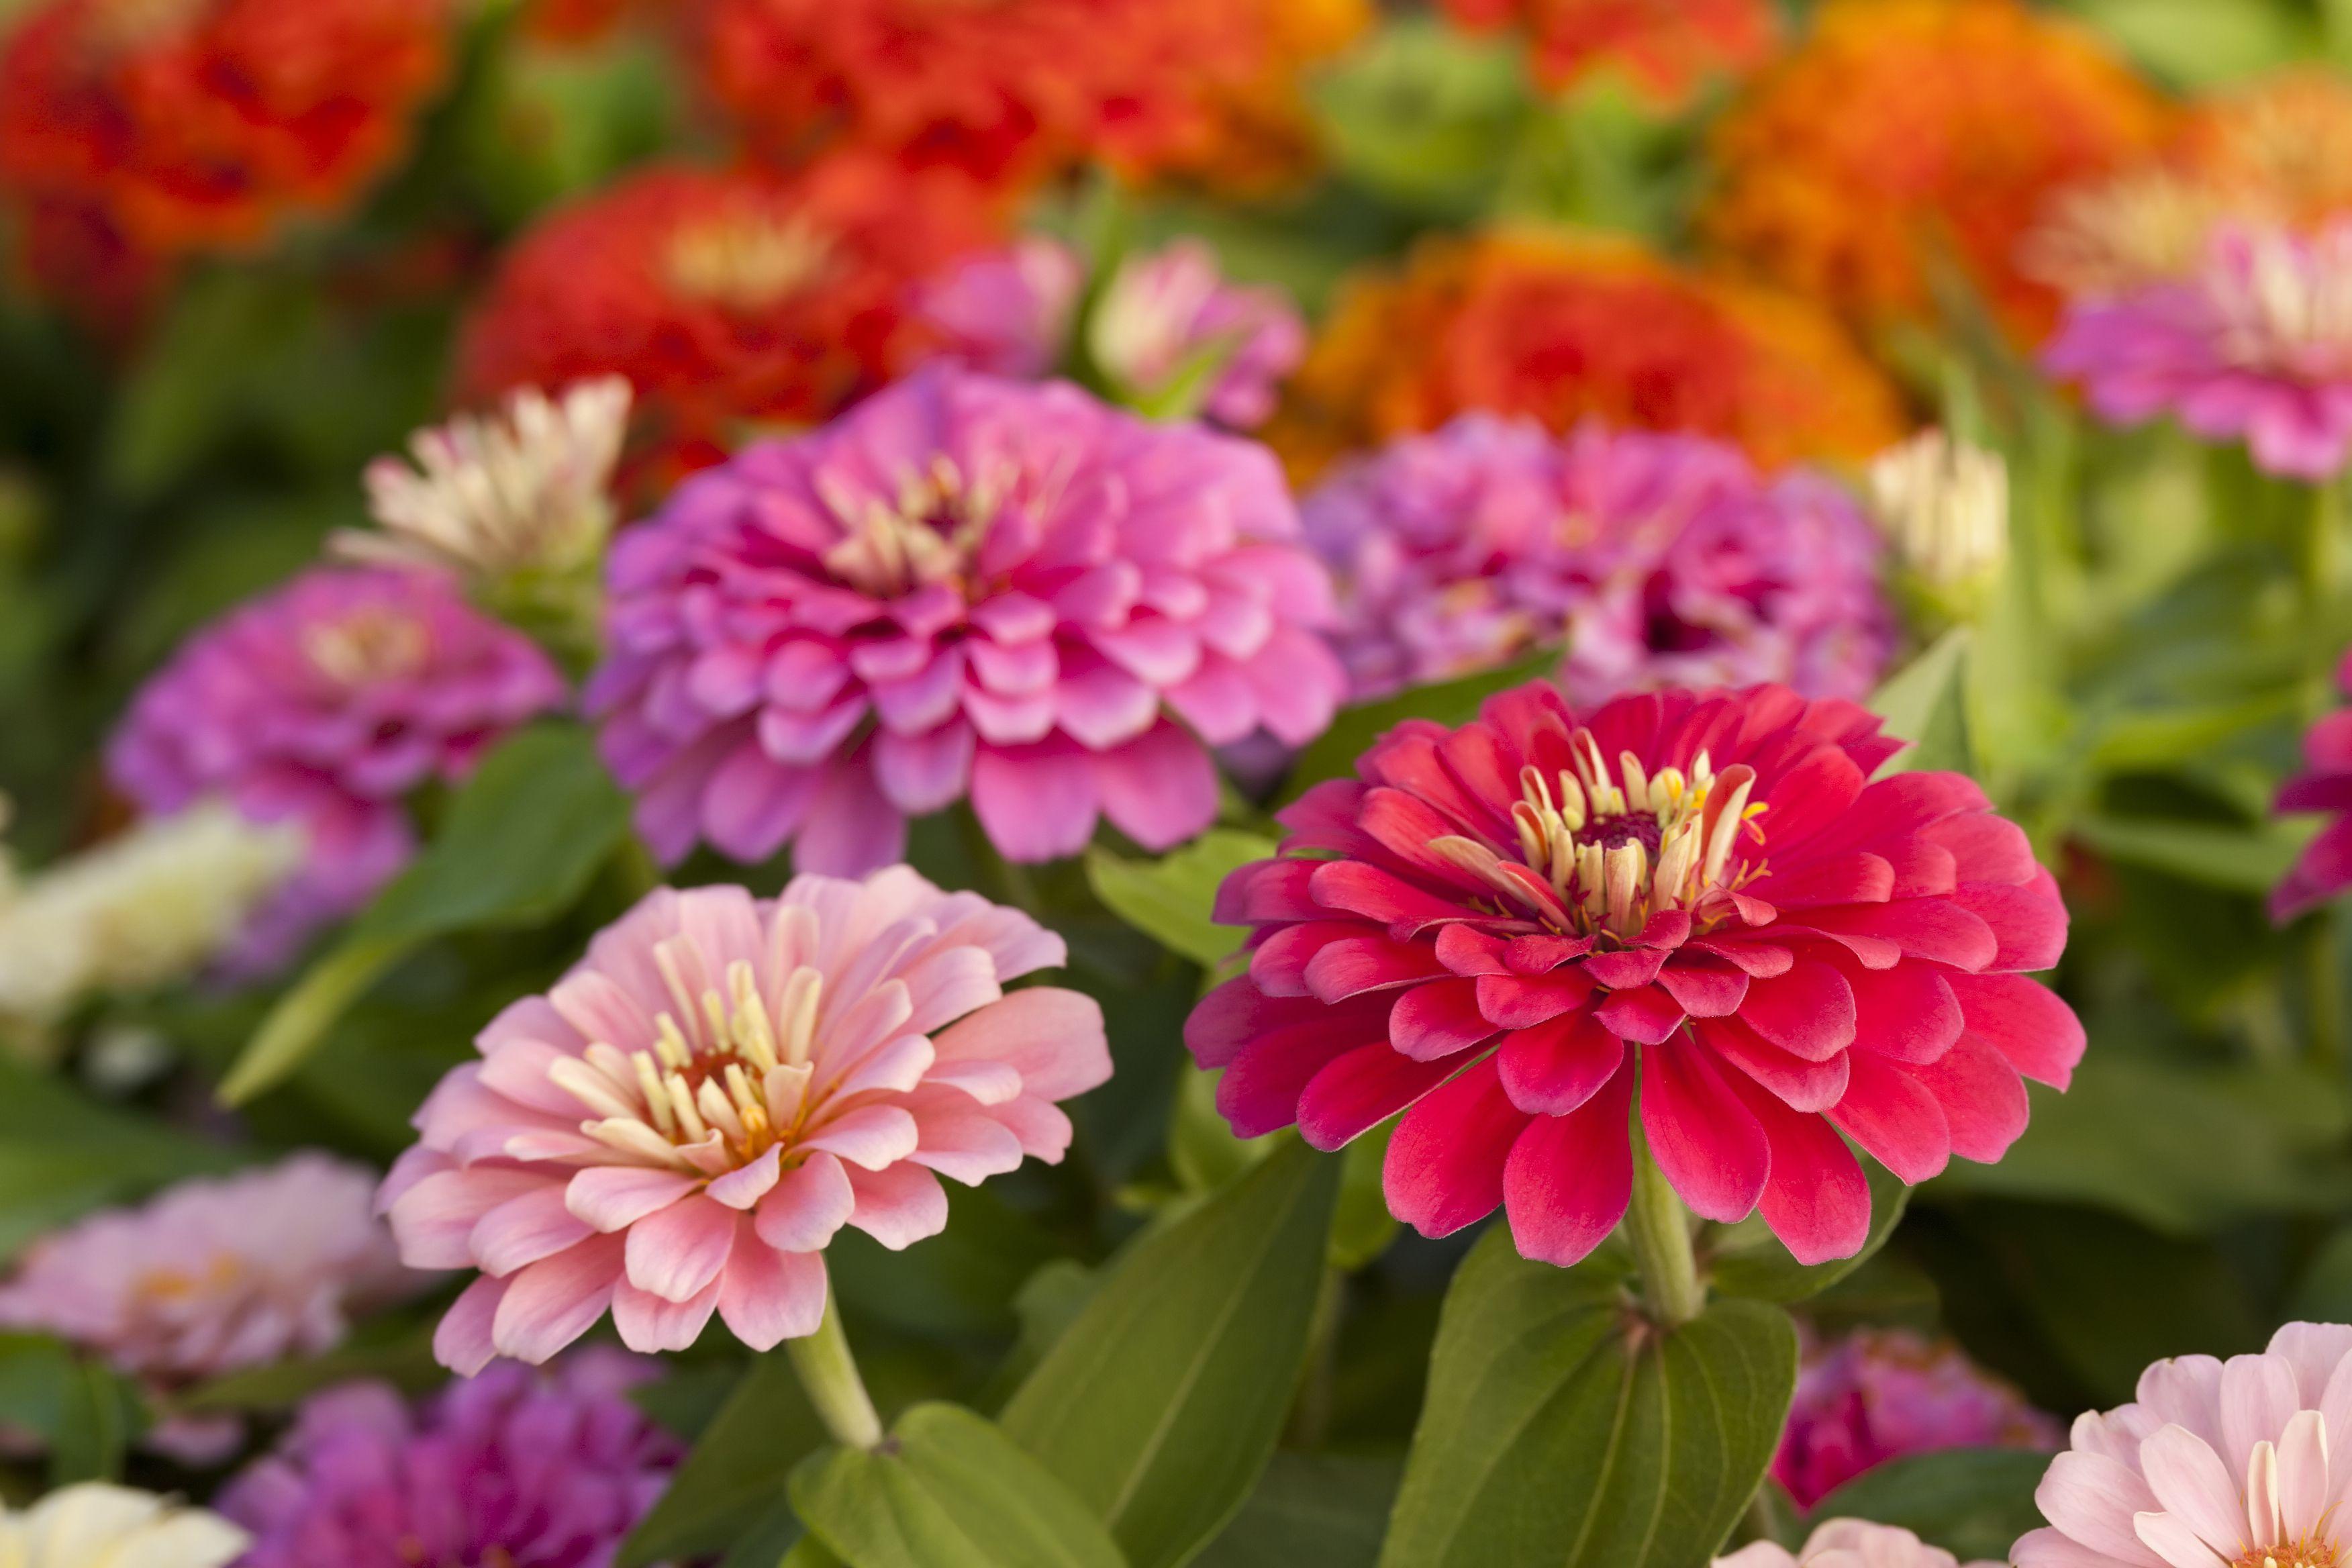 How to Grow Zinnias - A Burst of Hot Flower Colors